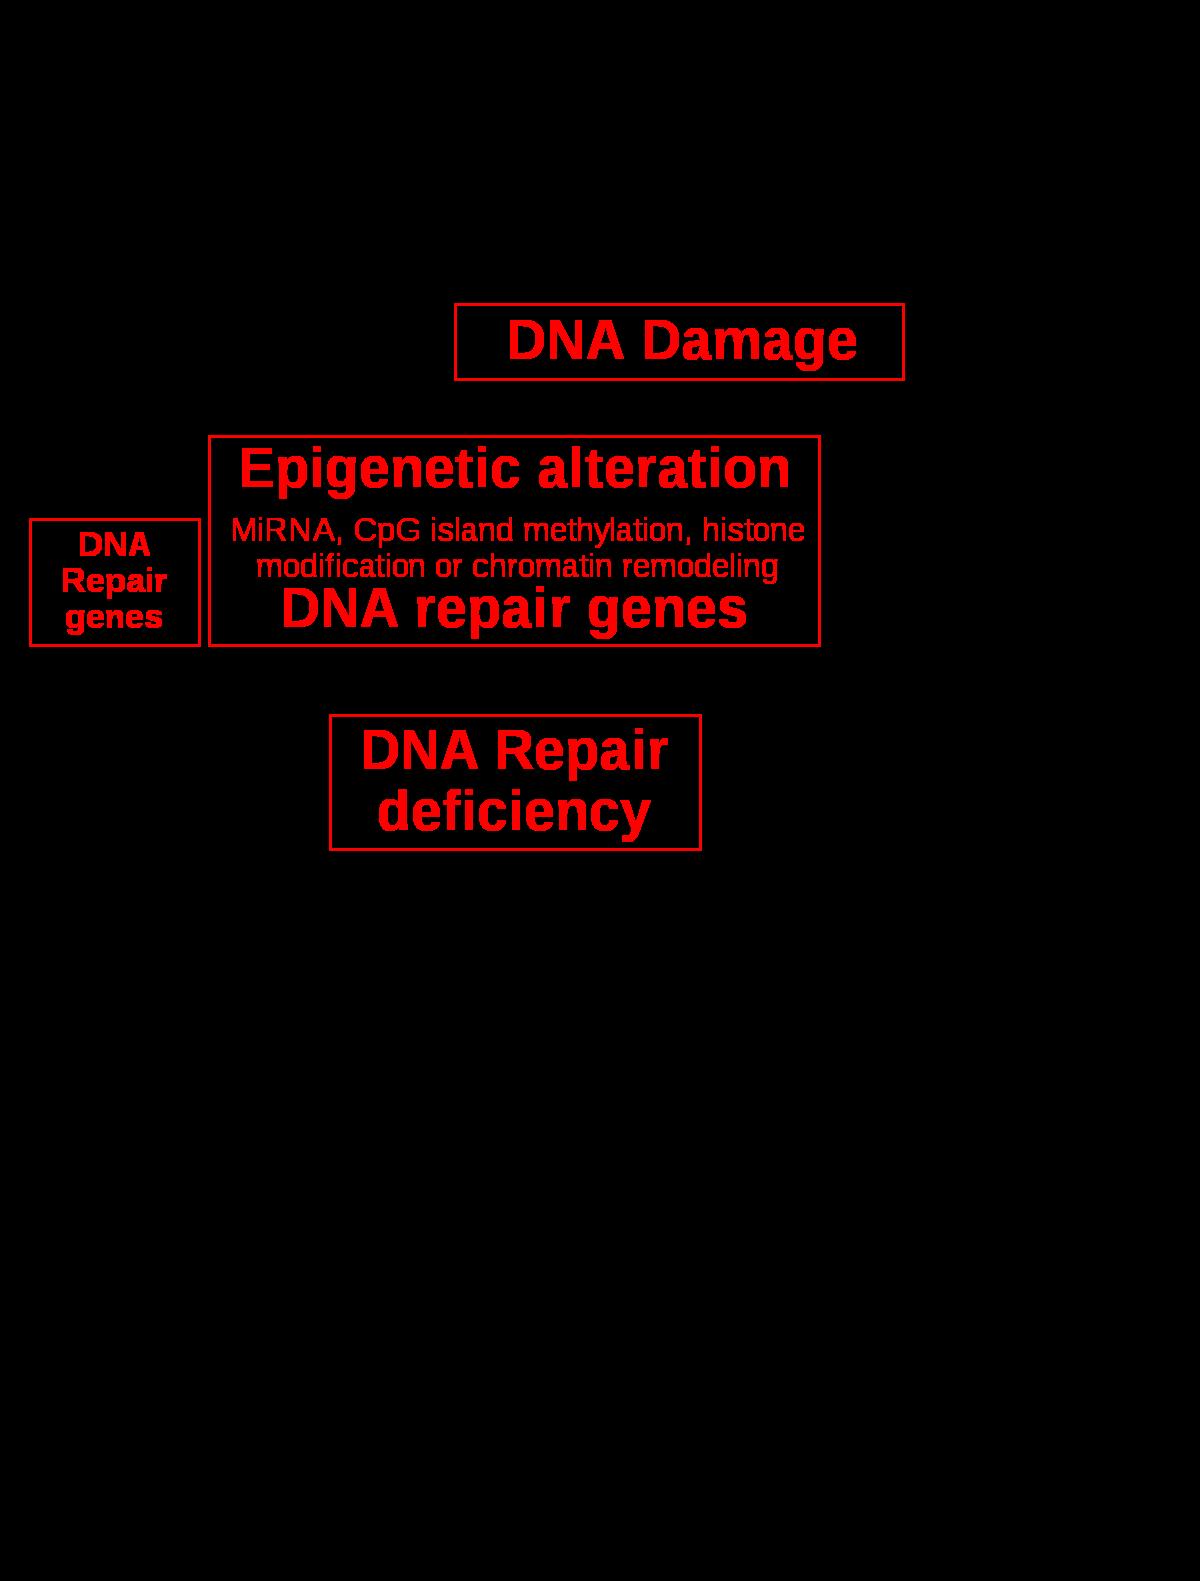 polip endometrium rák)